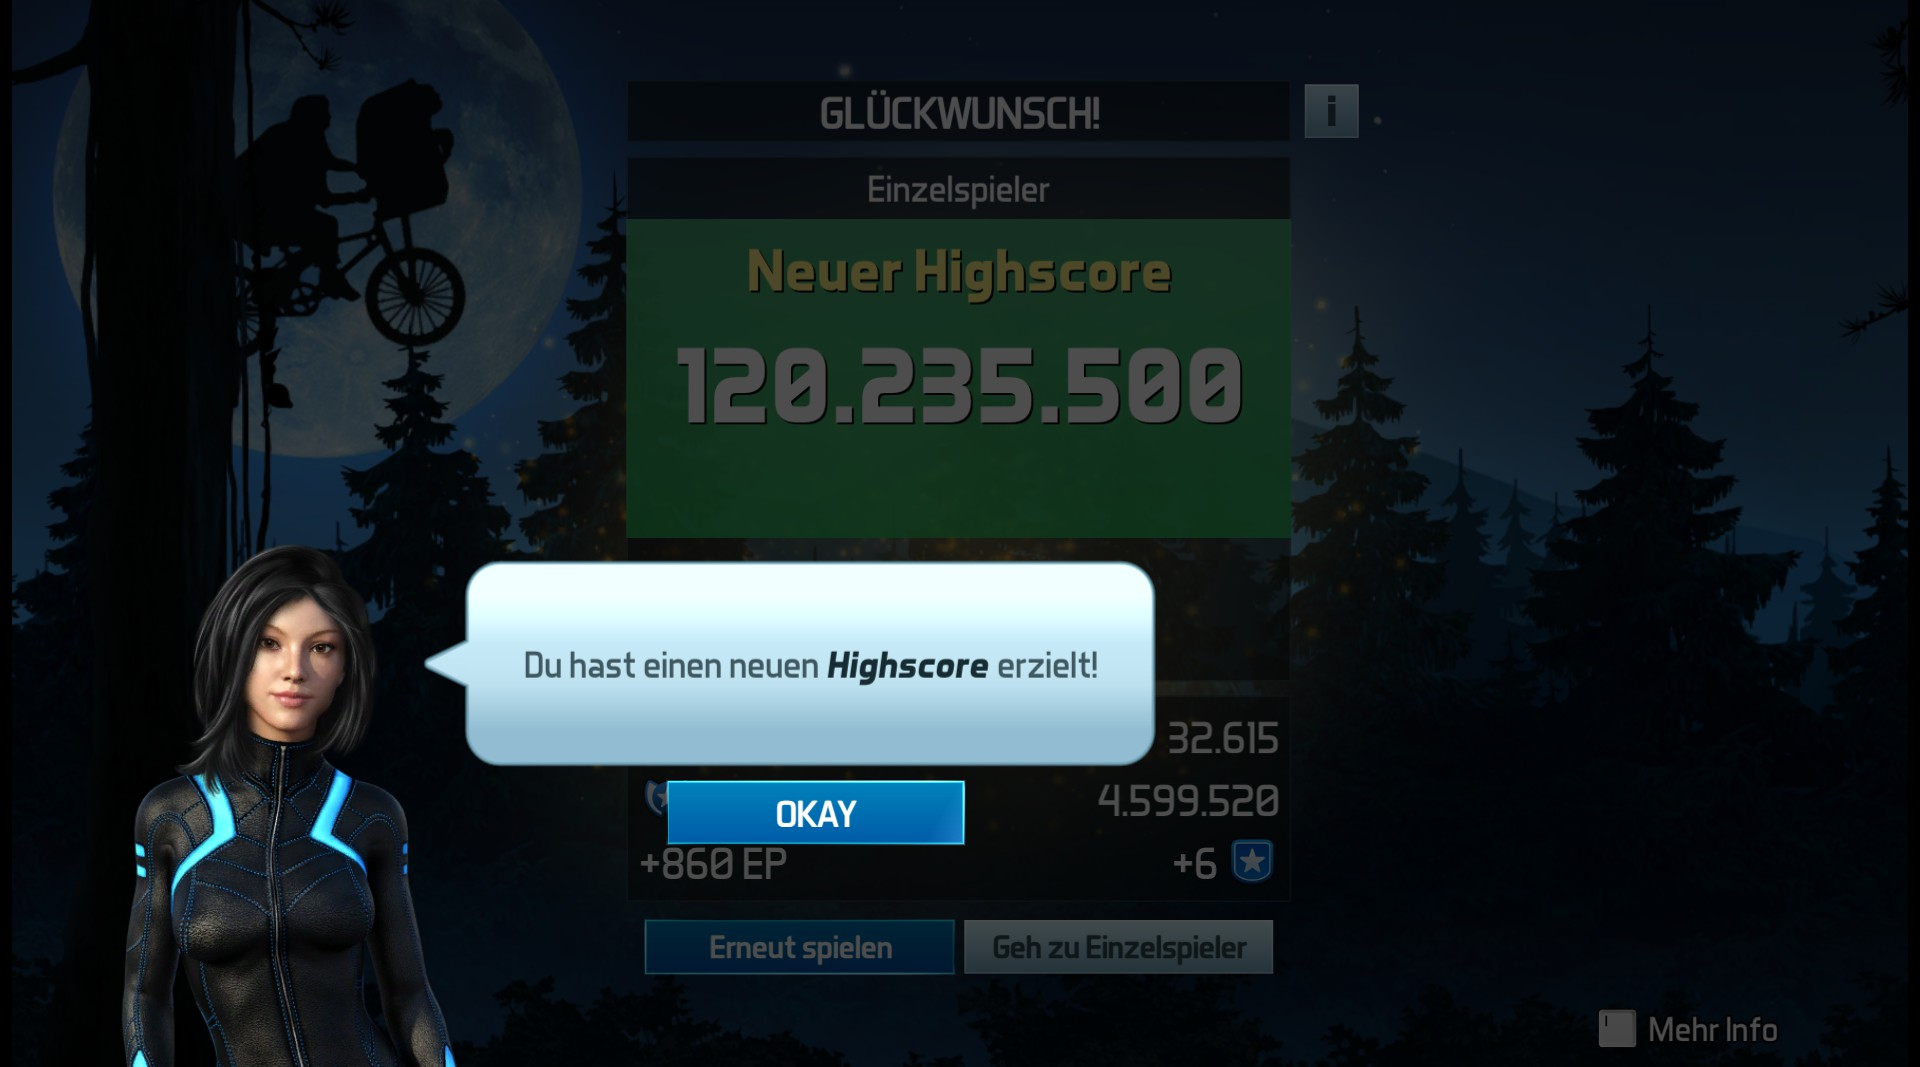 Pinball FX3: E.T. Pinball 120,235,500 points